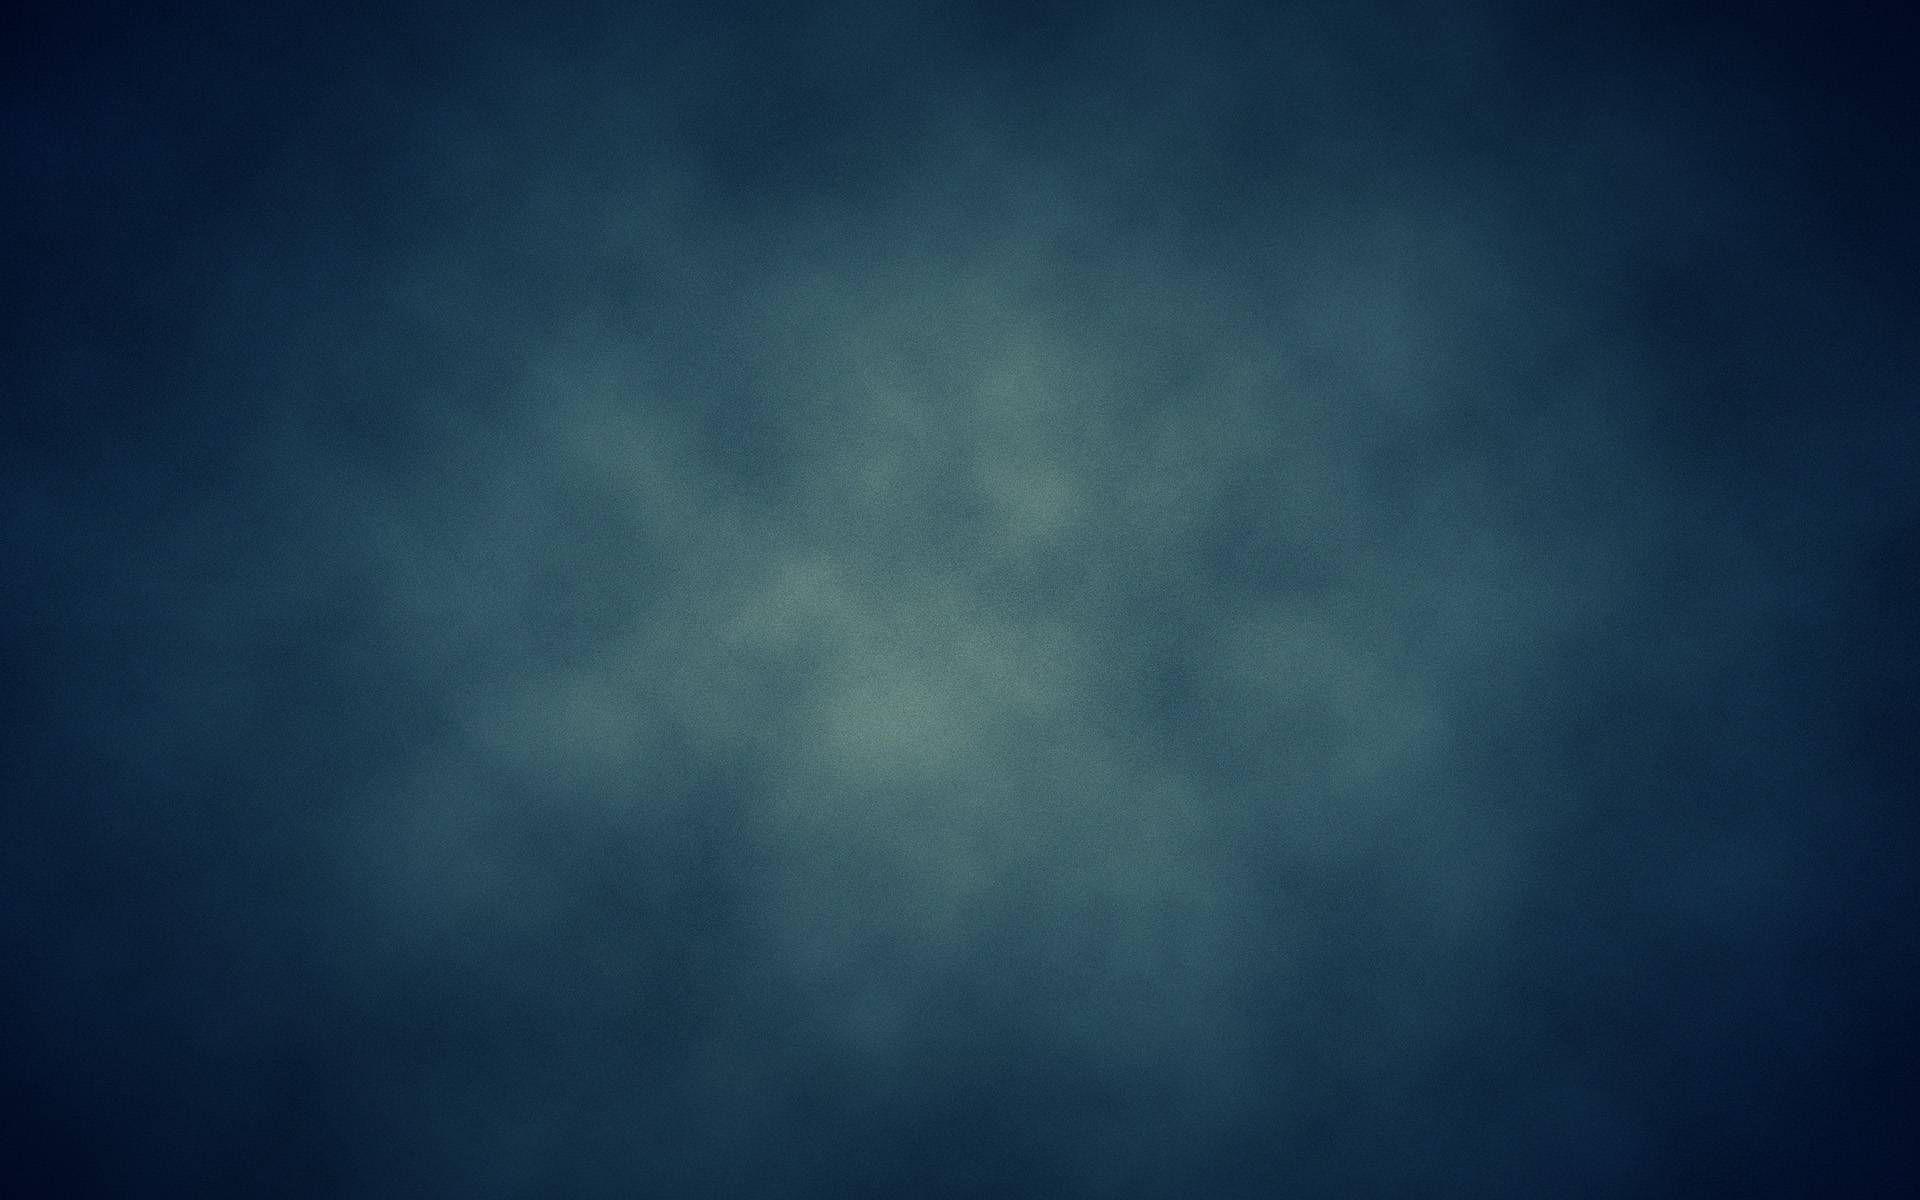 Download Cloud Custom Texture Blue Users Greerrrr